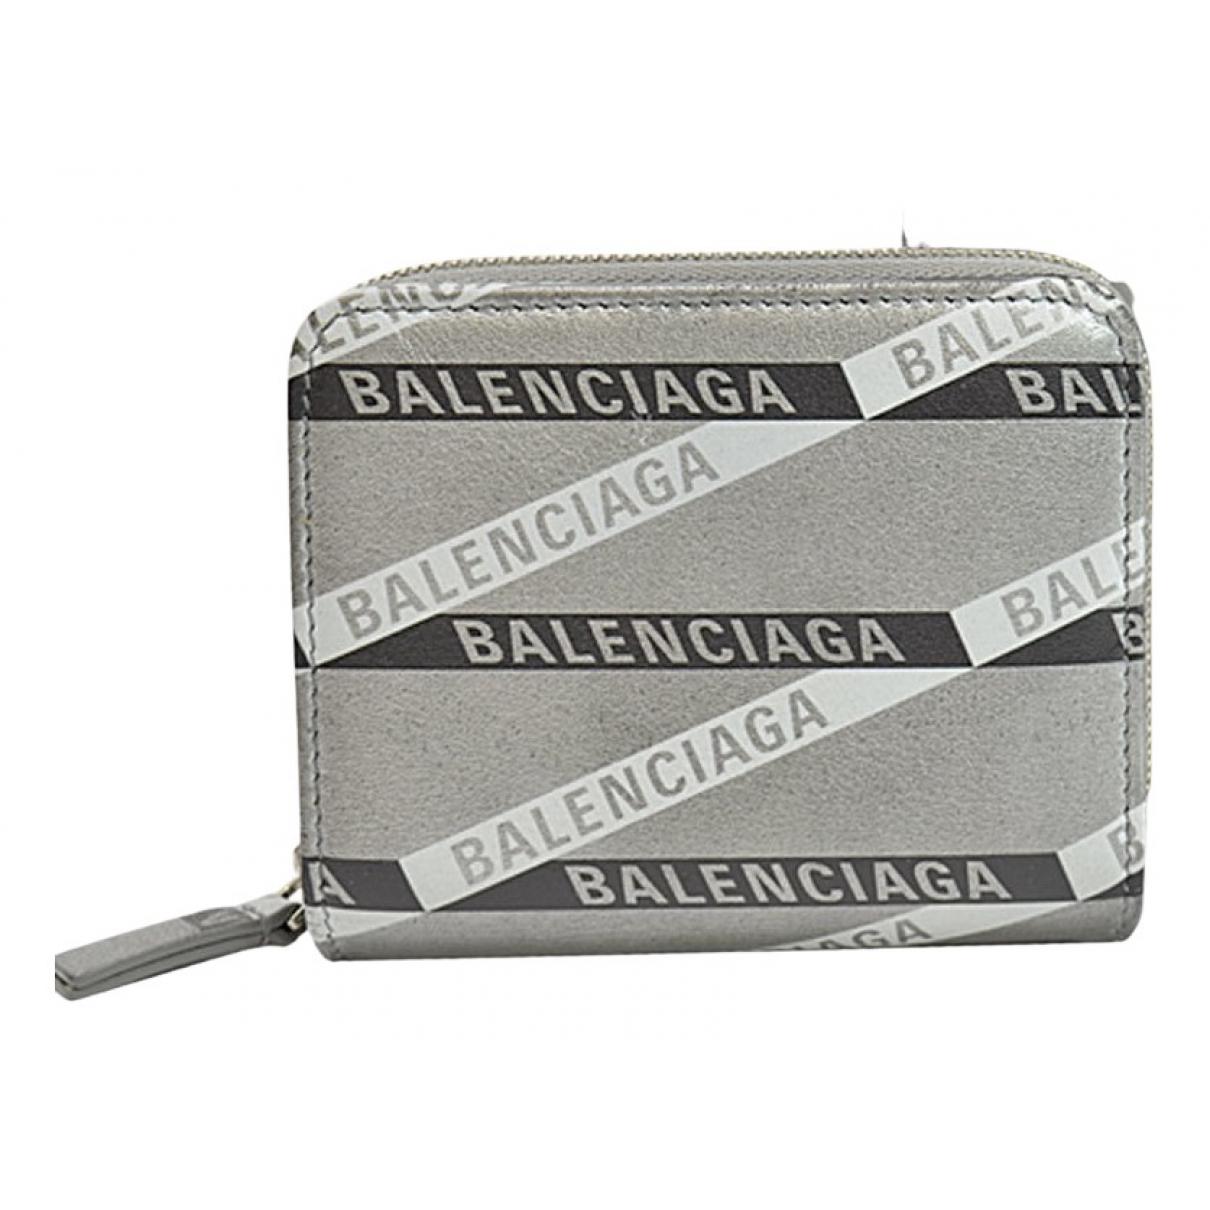 Balenciaga - Portefeuille   pour femme en cuir - multicolore